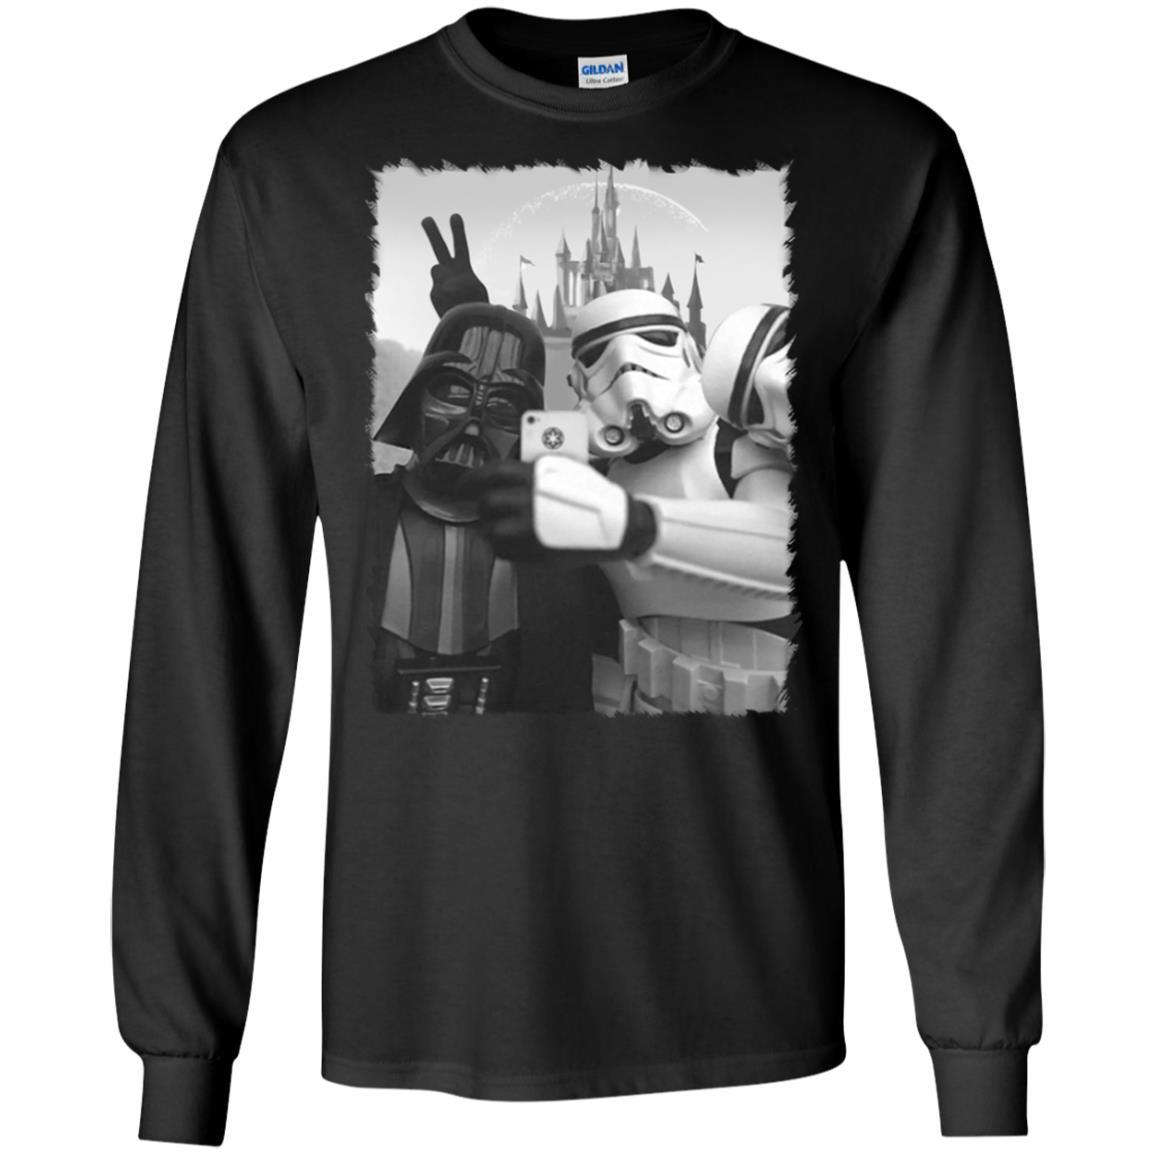 Selfie Star Wars Premium T-shirt noir Chewbacca Stormtrooper R2D2